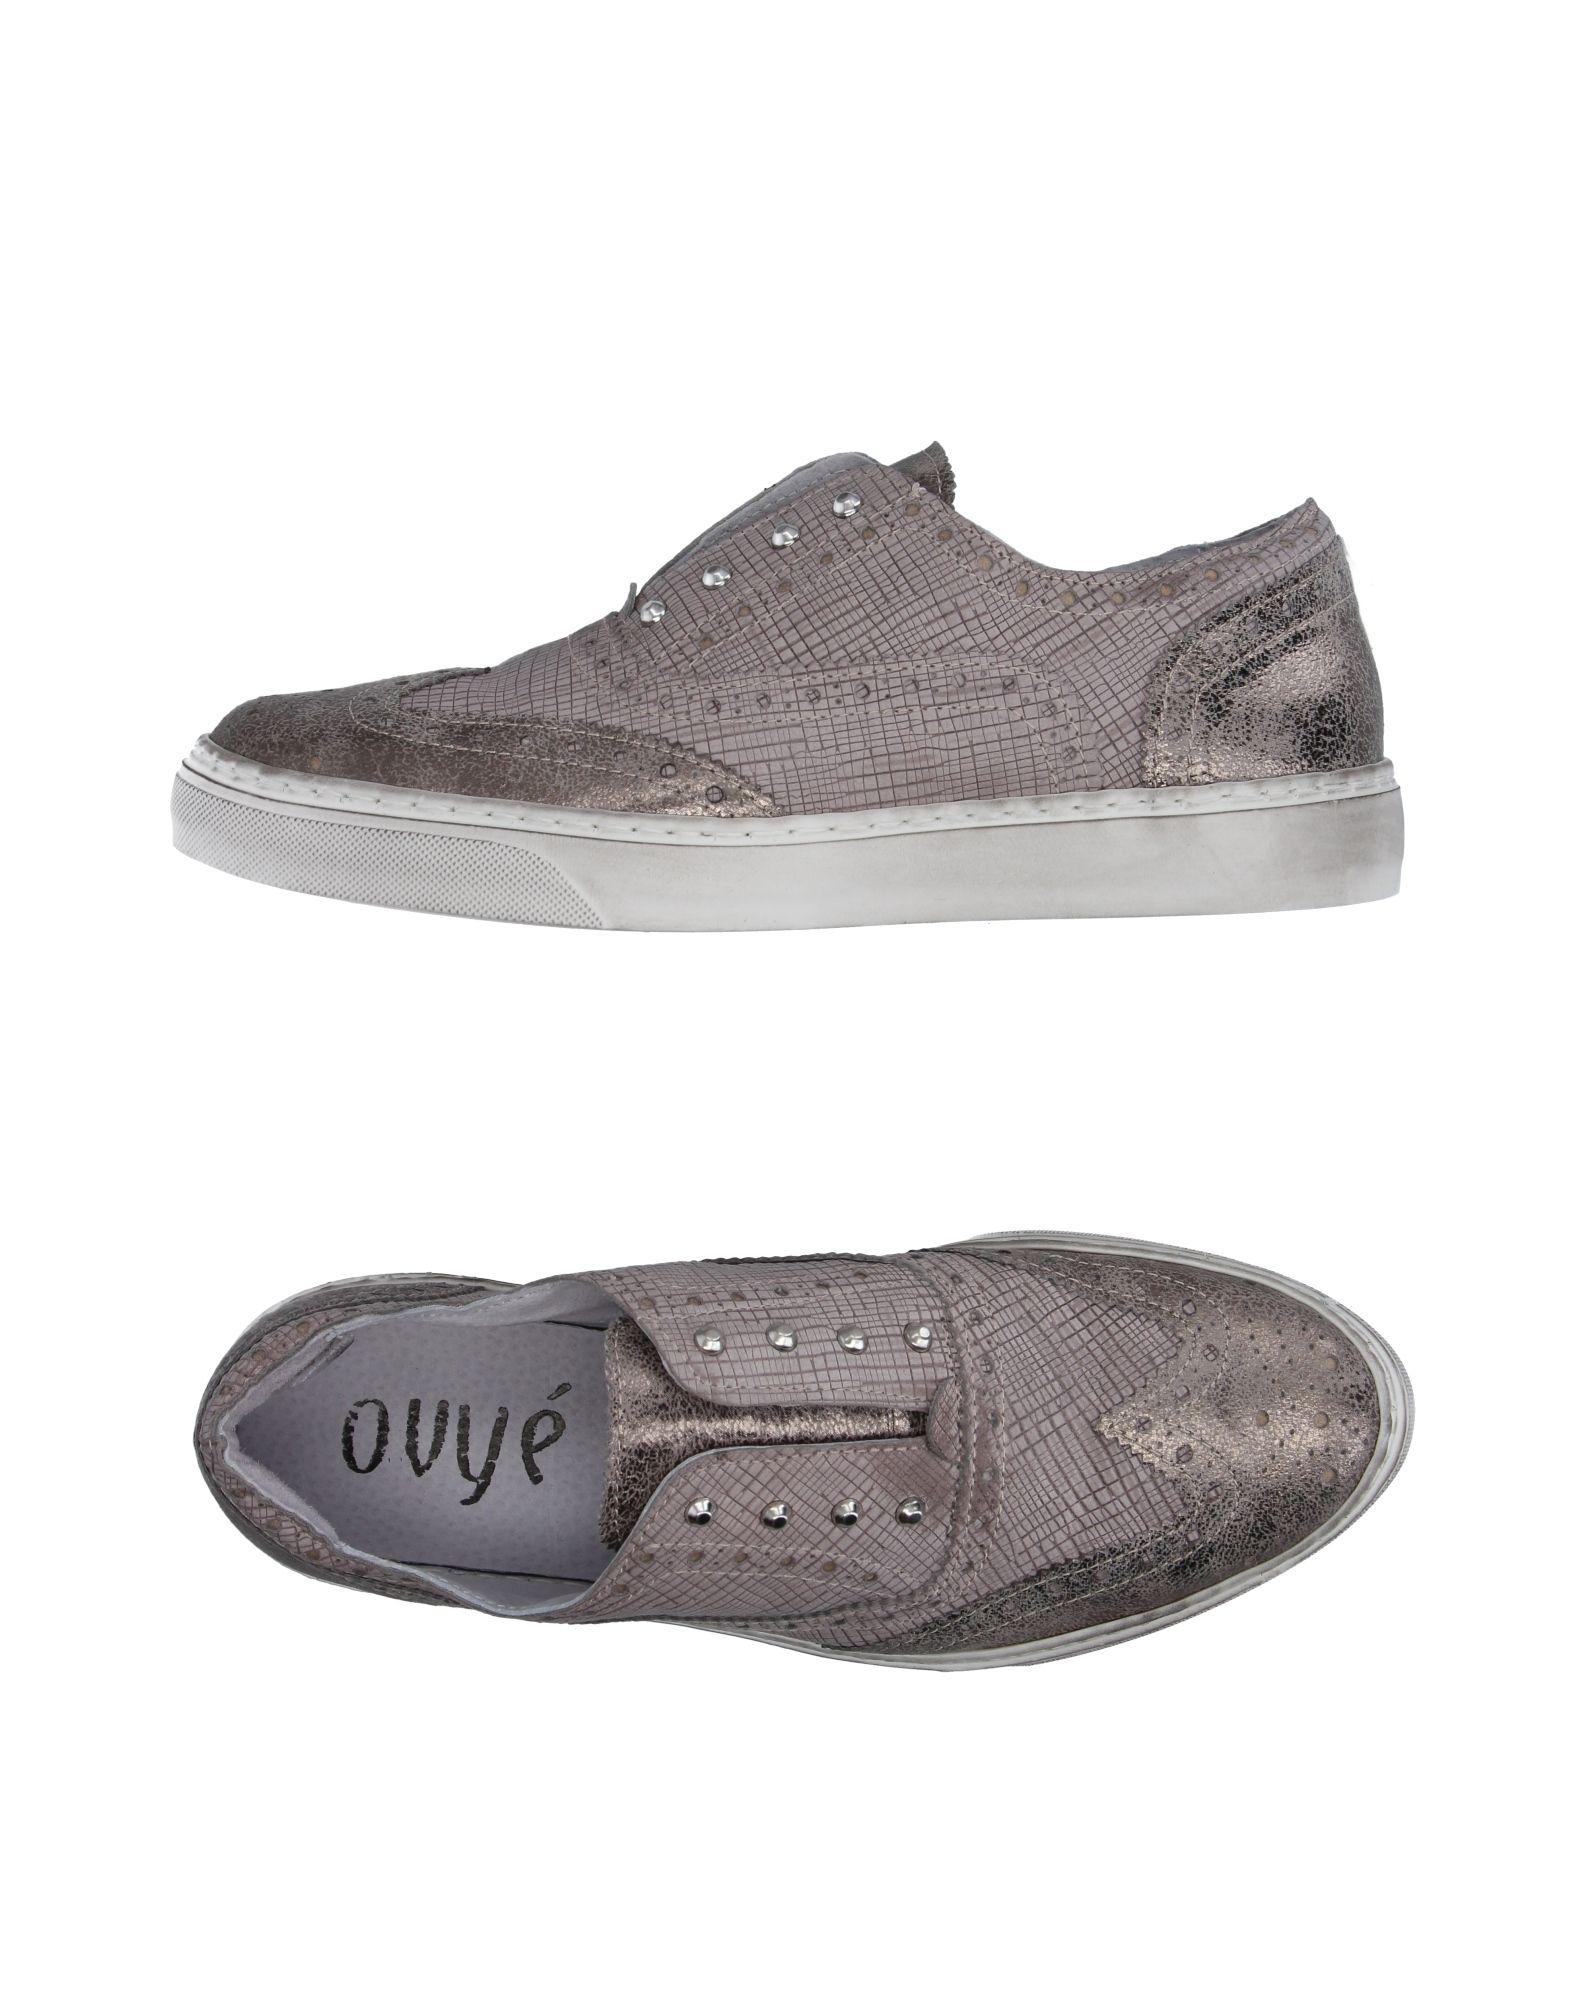 Ovye' By Cristina Qualität Lucchi Sneakers Damen  11161640SP Gute Qualität Cristina beliebte Schuhe 55bc60